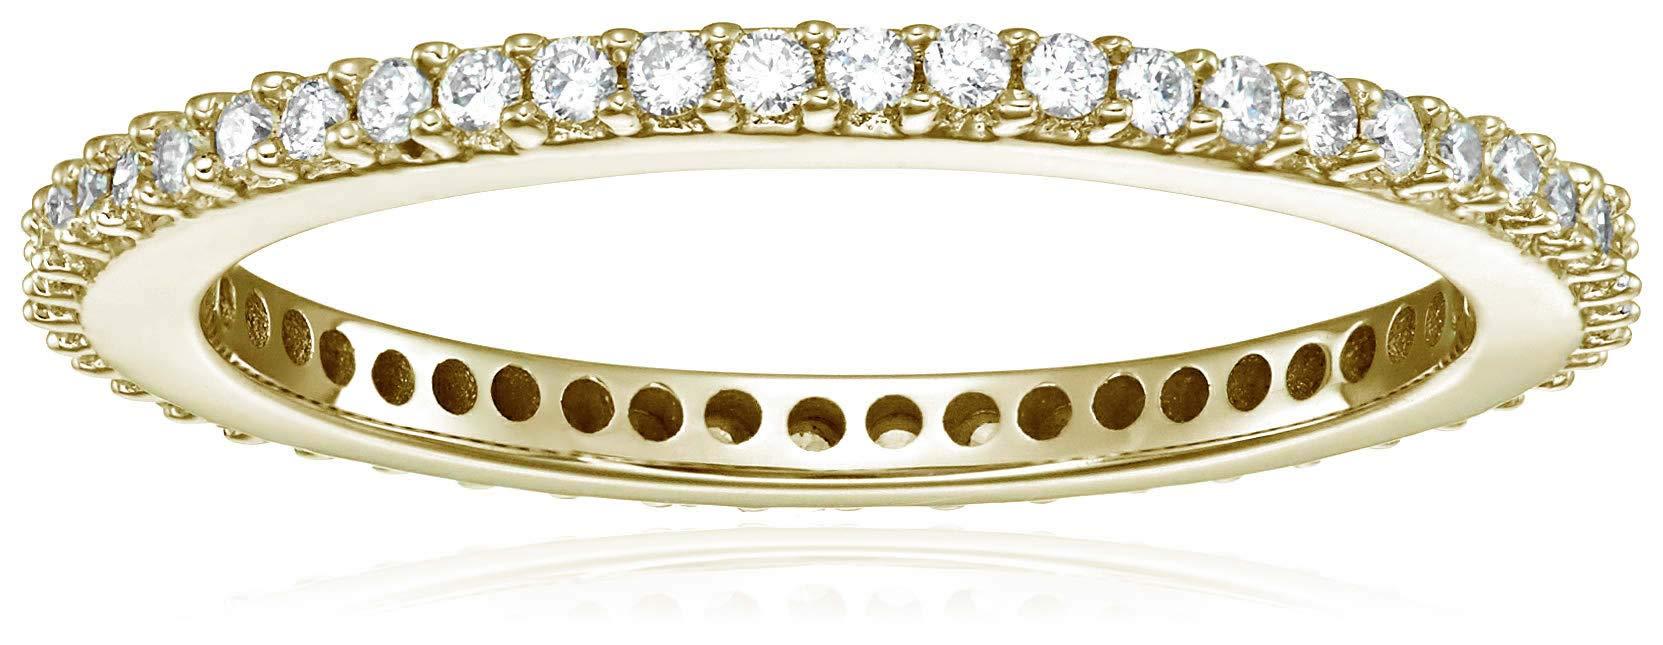 Vir Jewels 1/2 cttw Diamond Eternity Ring 14K Yellow Gold Wedding Band Size 6.5